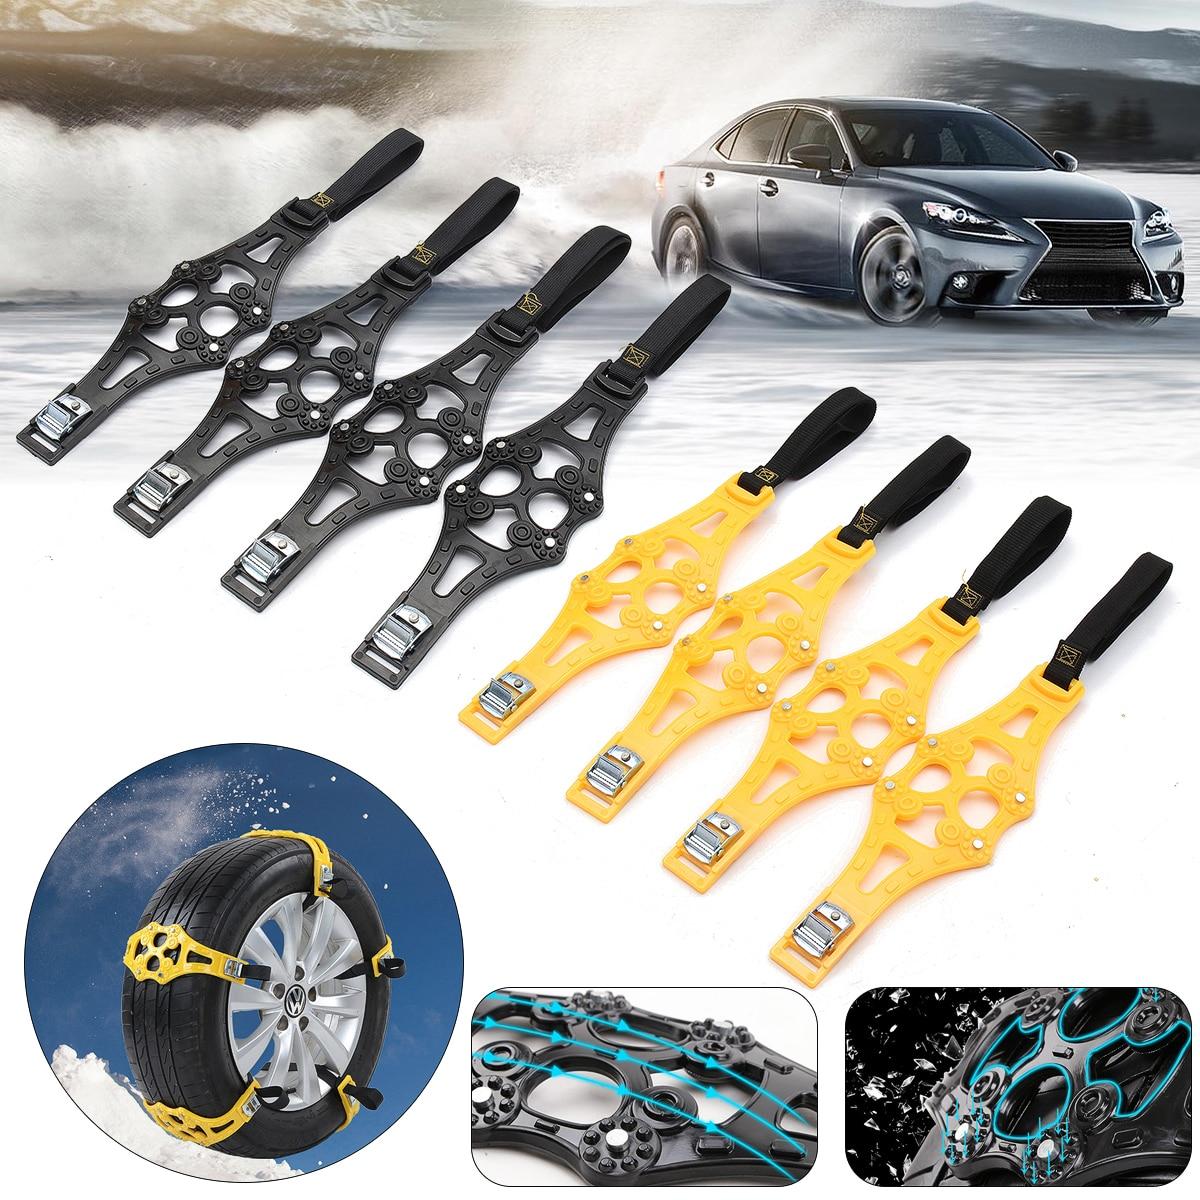 8pcs/set 4pcs/set Car Tyre Winter Roadway Safety Tire Snow Adjustable Anti-skid Safety Double Snap Skid Wheel TPU Chains